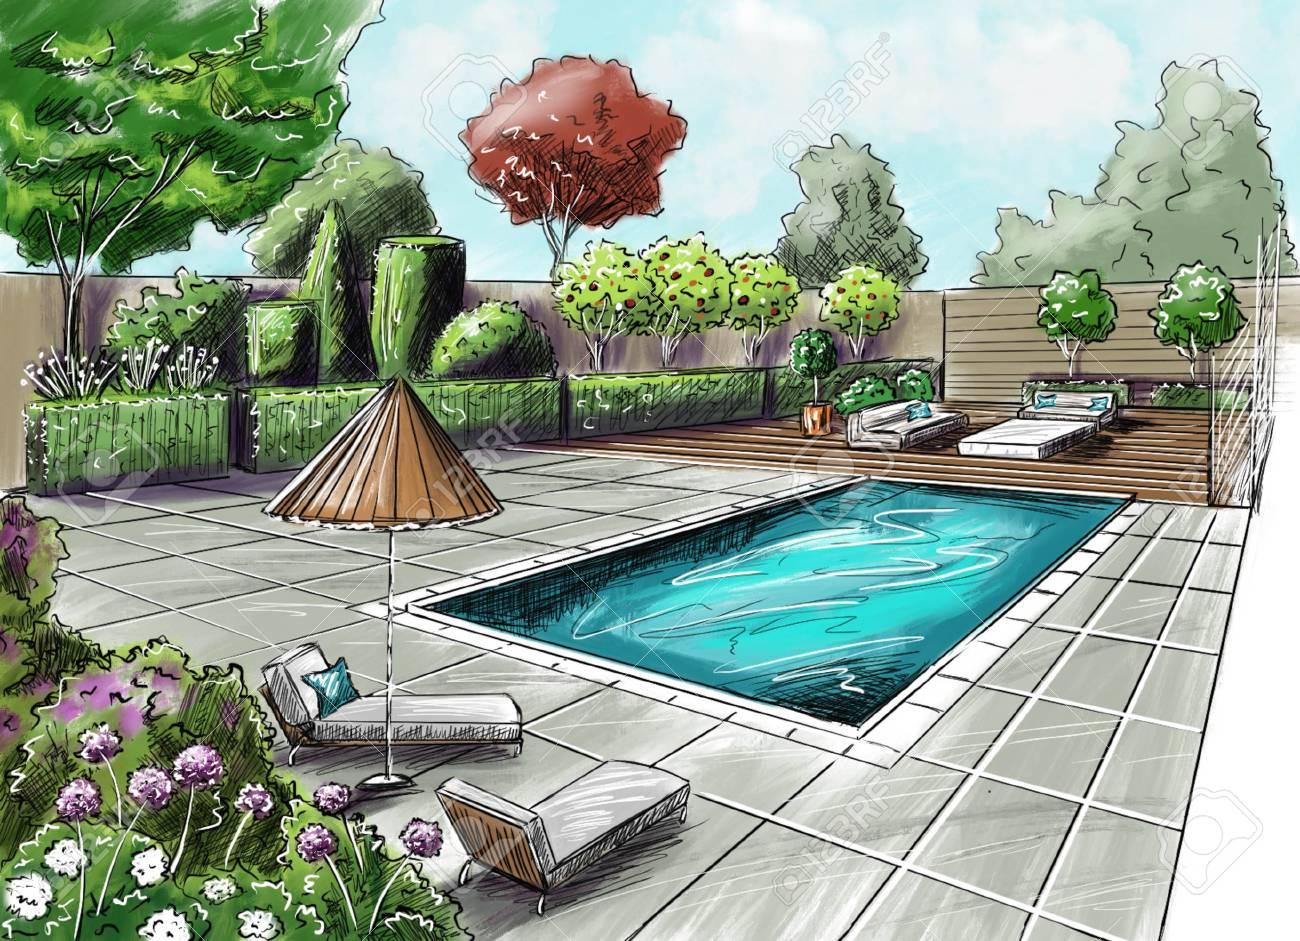 Figure Landscape Design Project Landscape Architecture Plan Stock Photo Picture And Royalty Free Image Image 104419135